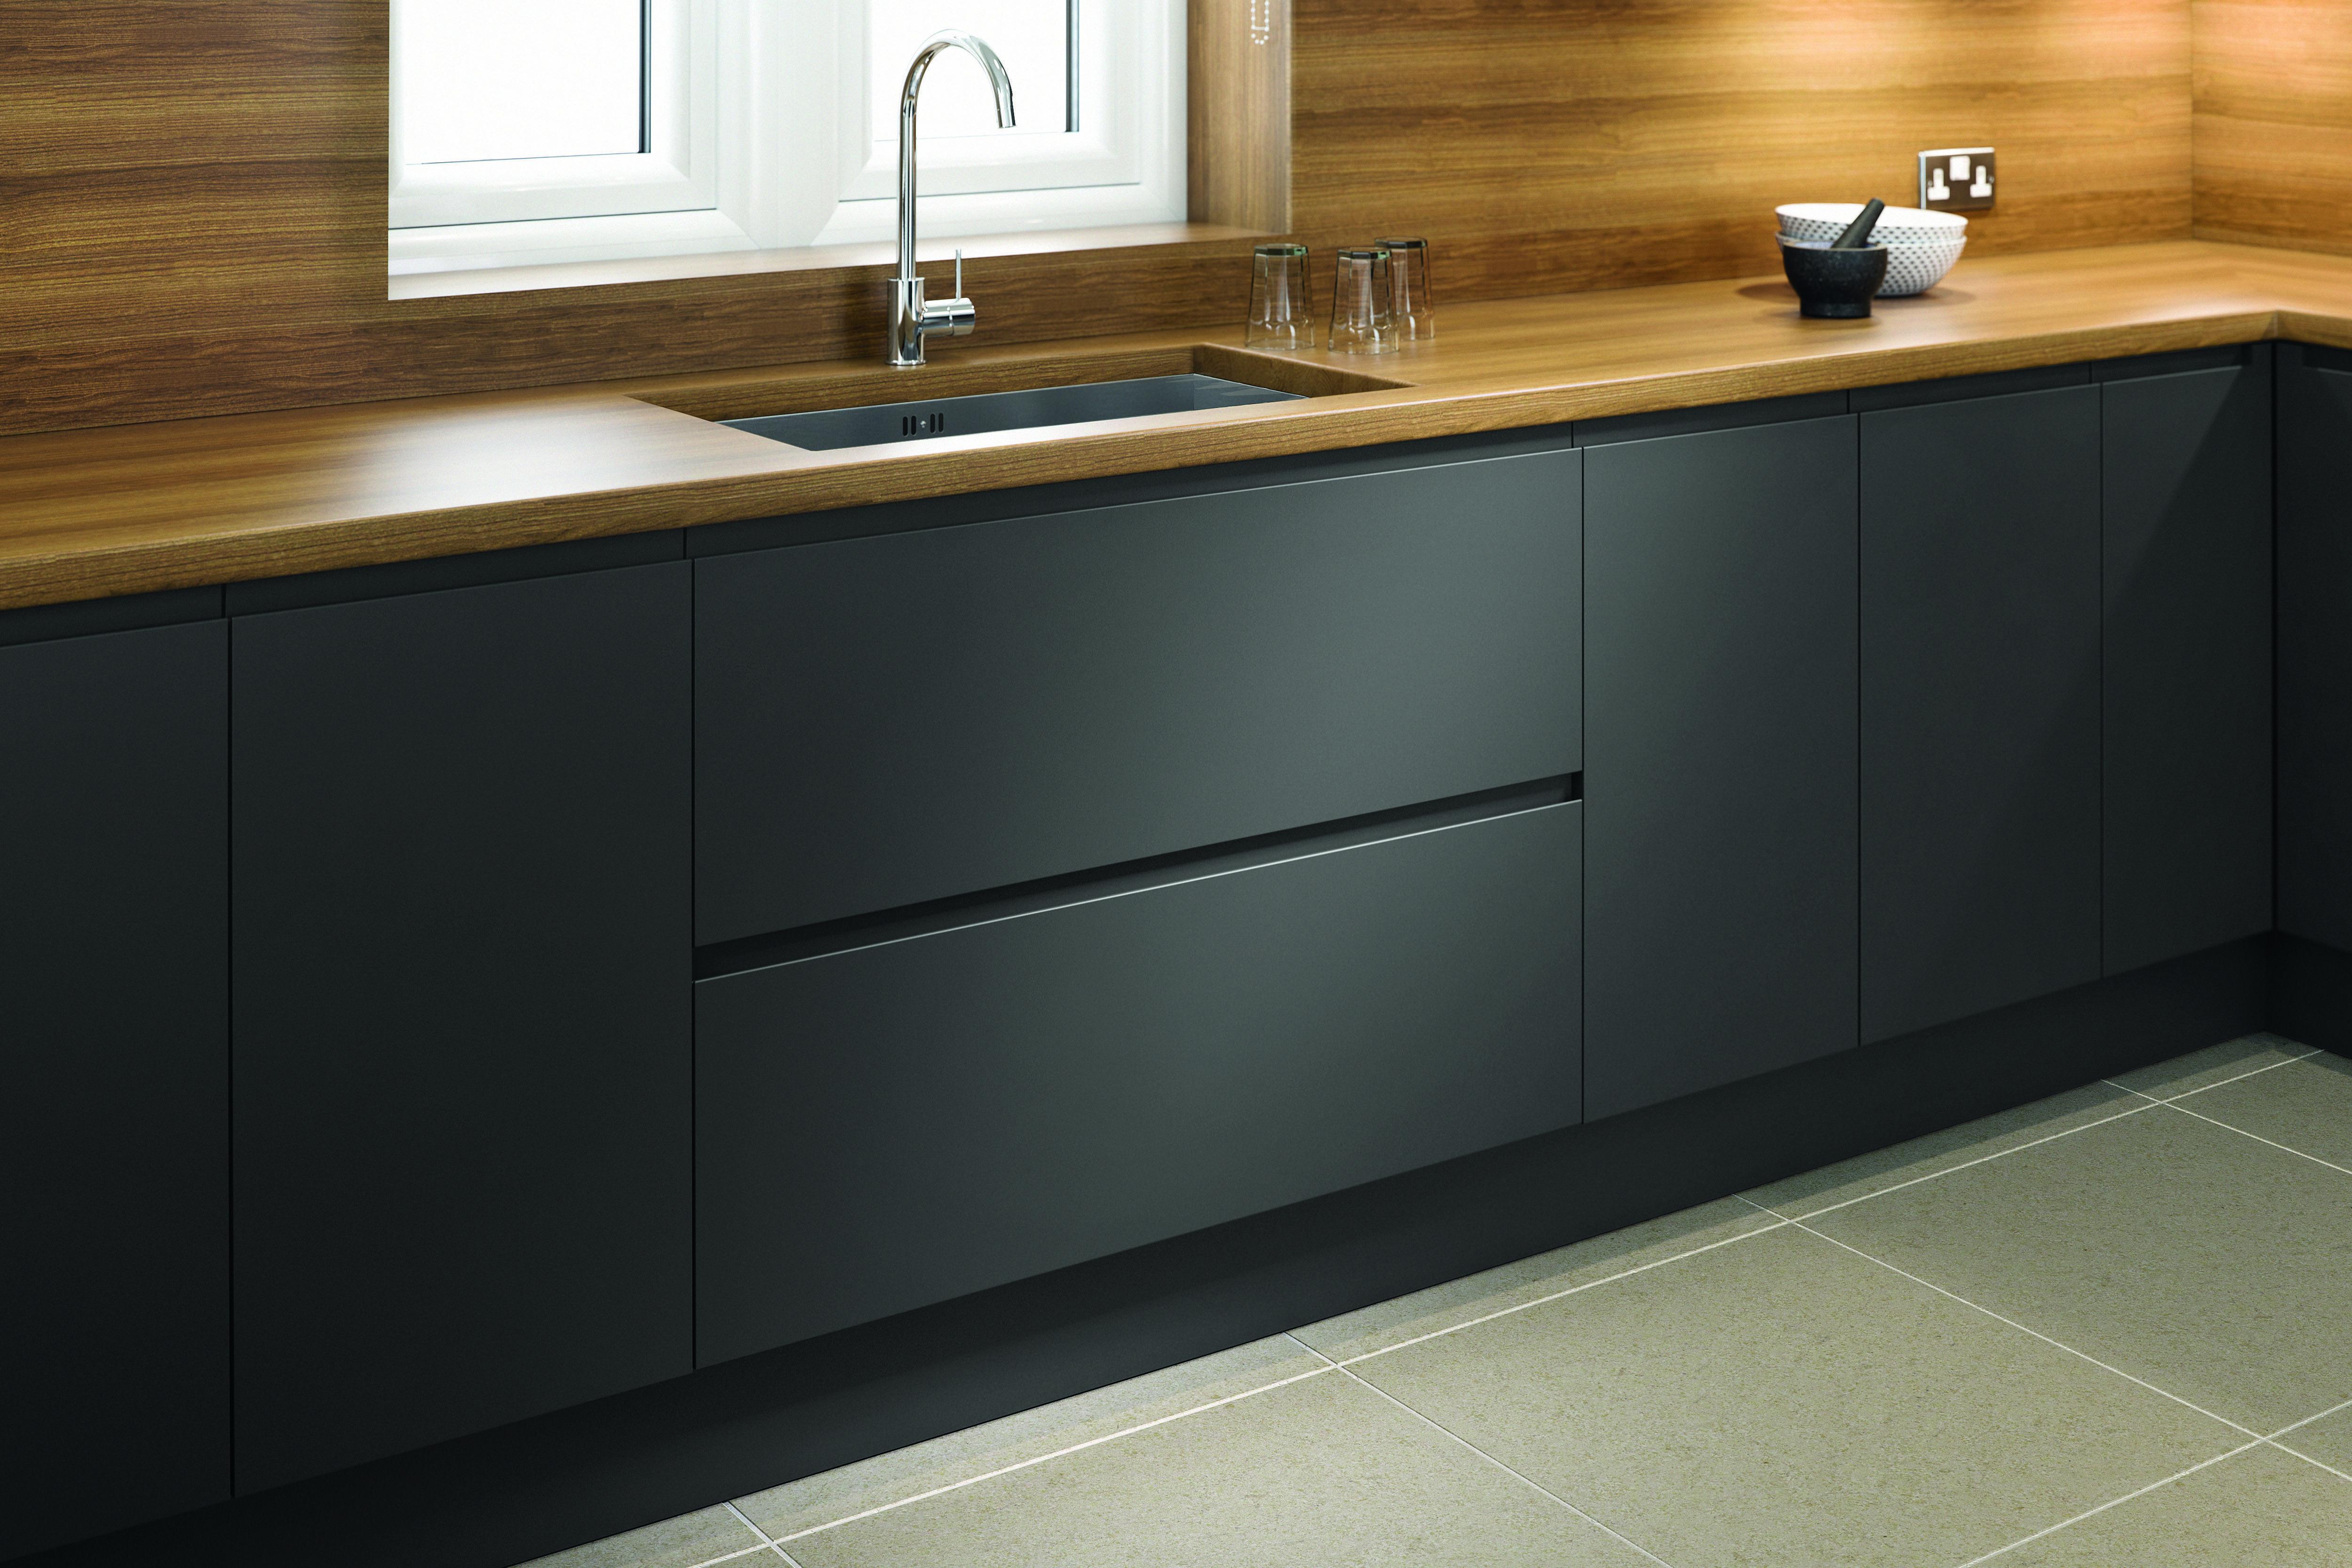 Categorymodern Home Decor Kitchen SalePrice47 in 2020